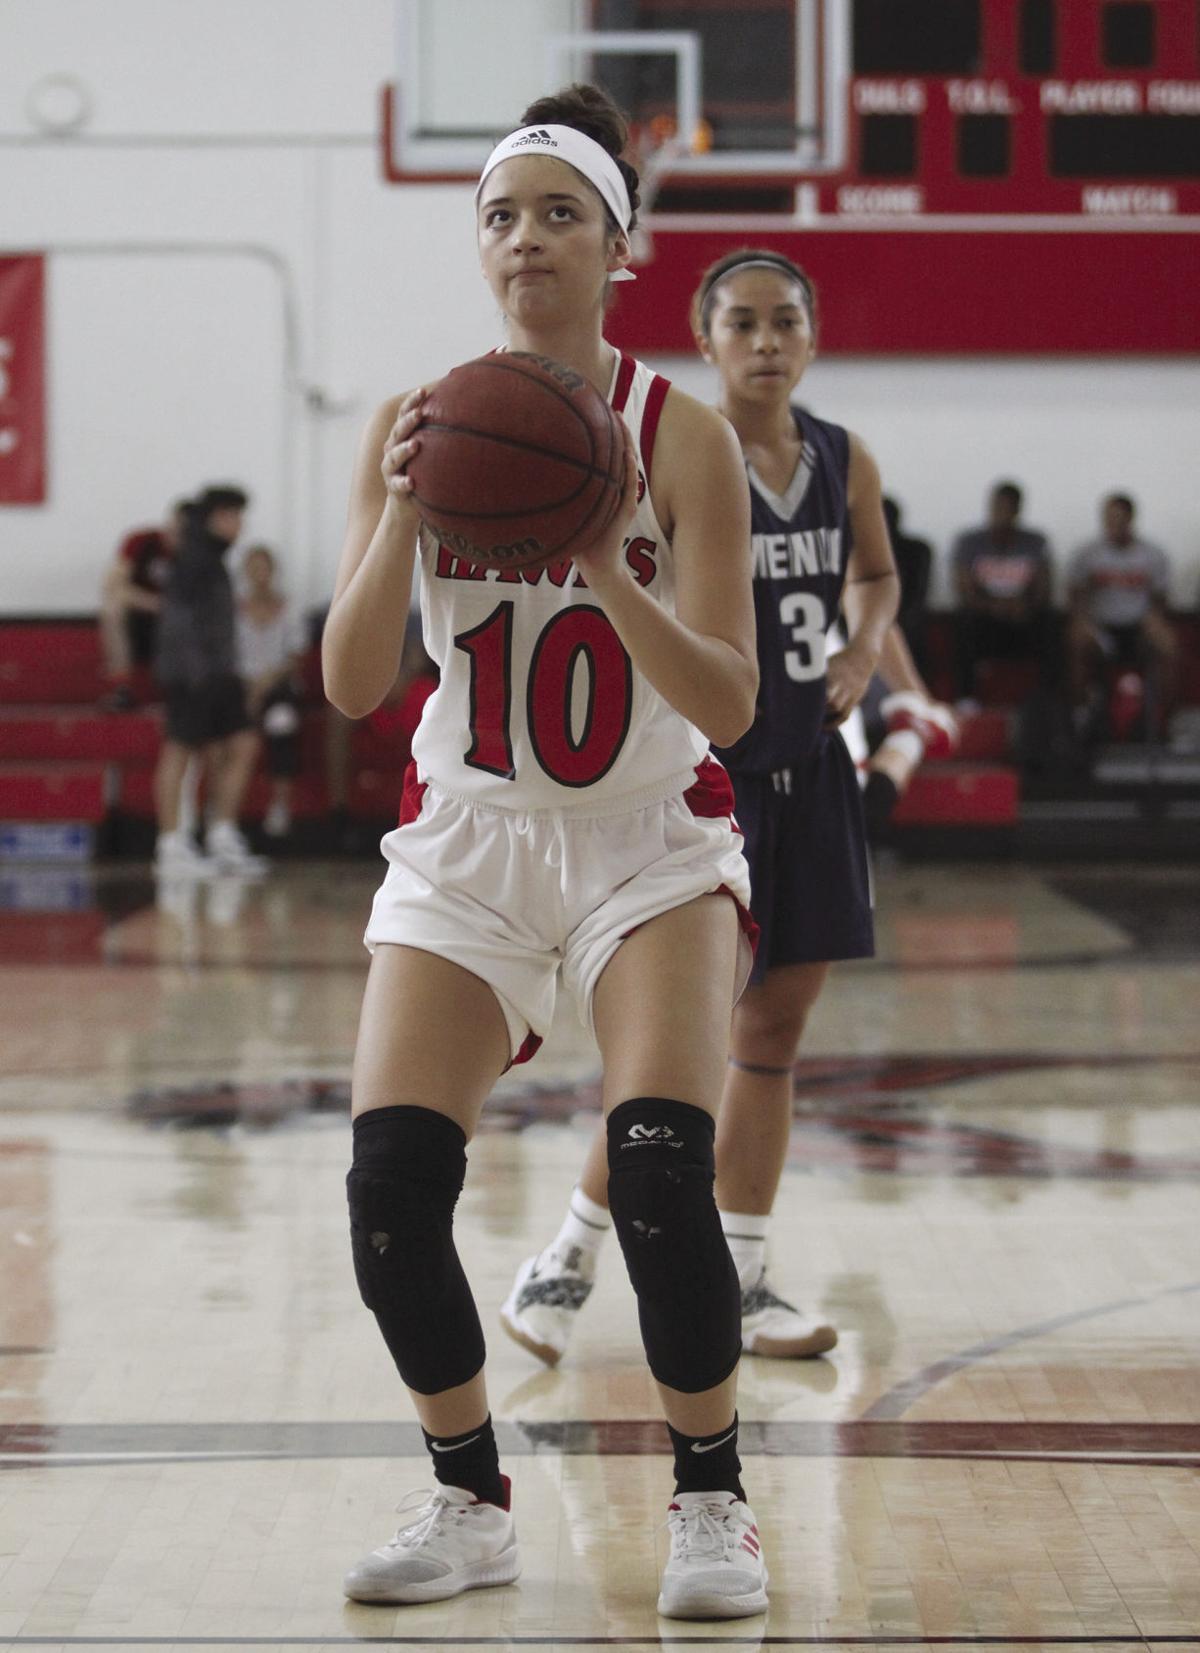 College basketball: Lodi graduate Valenzuela ready to step up